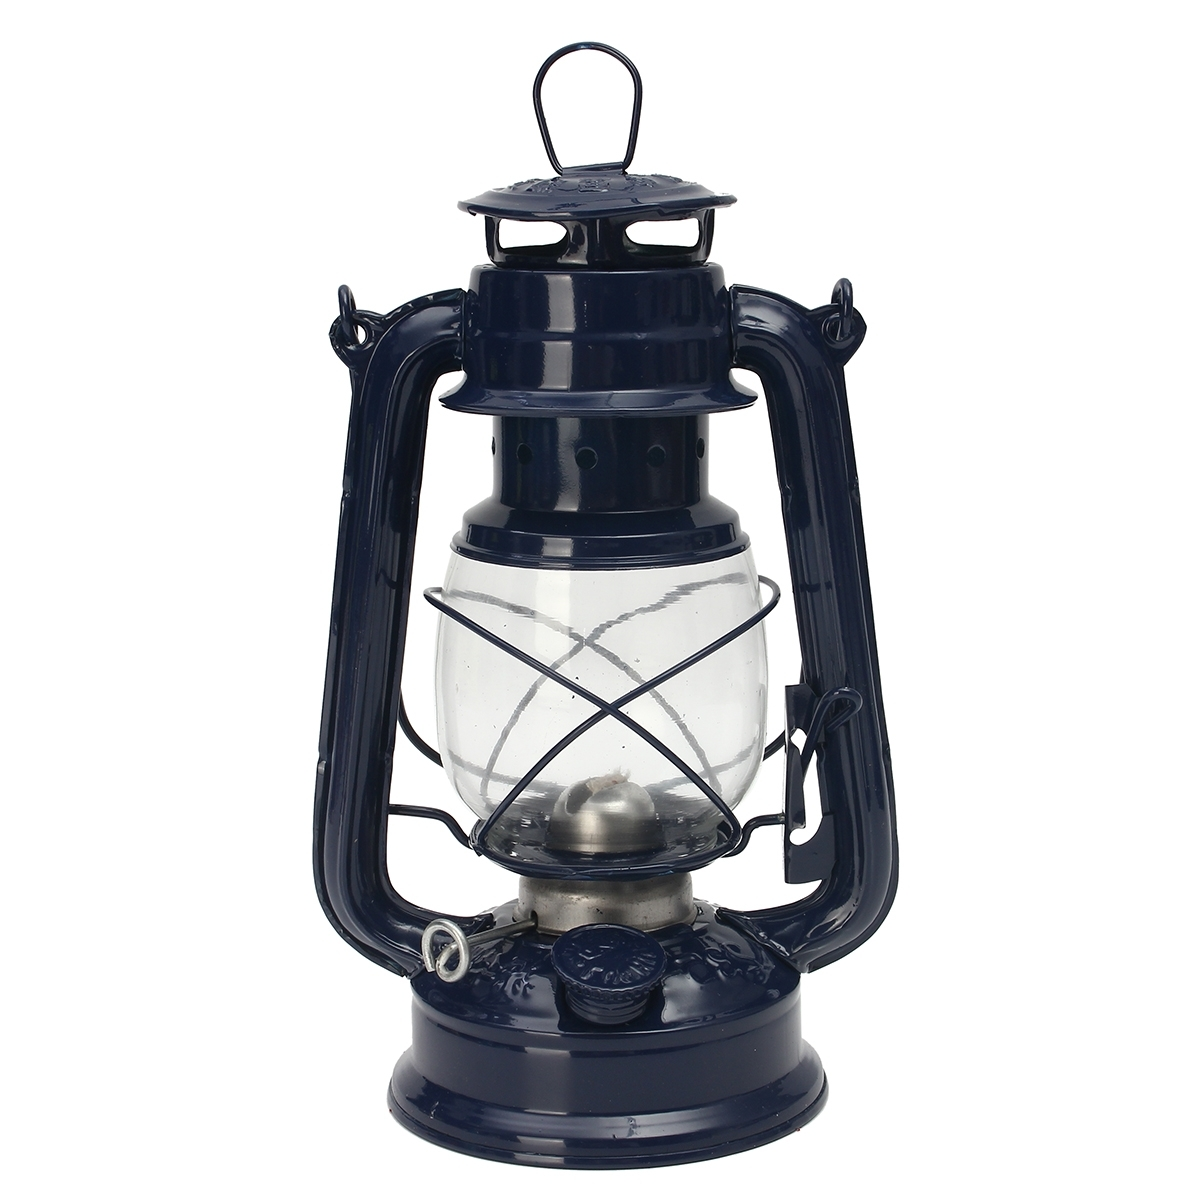 Retro Oil Lantern Garden Outdoor Camp Kerosene Paraffin Hurricane With Regard To Most Popular Outdoor Kerosene Lanterns (View 15 of 20)